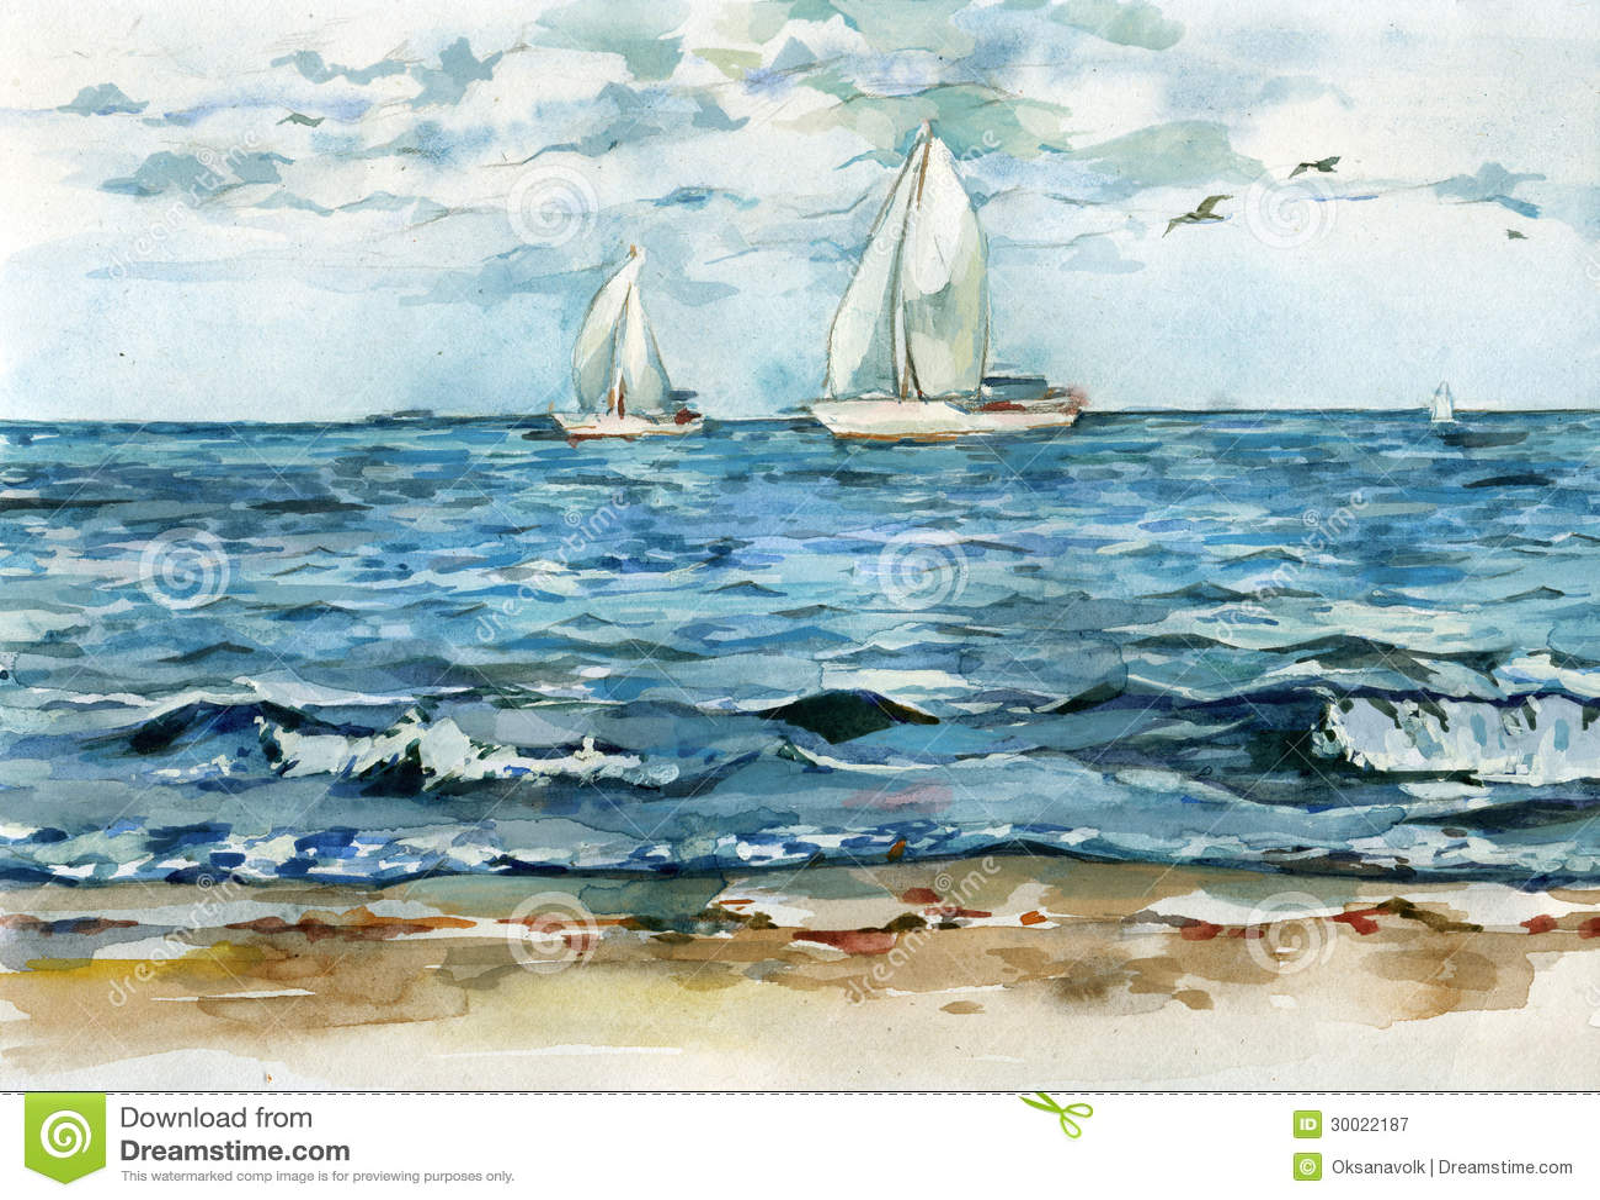 Jachtu driftind w spokojnej błękitnej dennej akwareli ilustraci